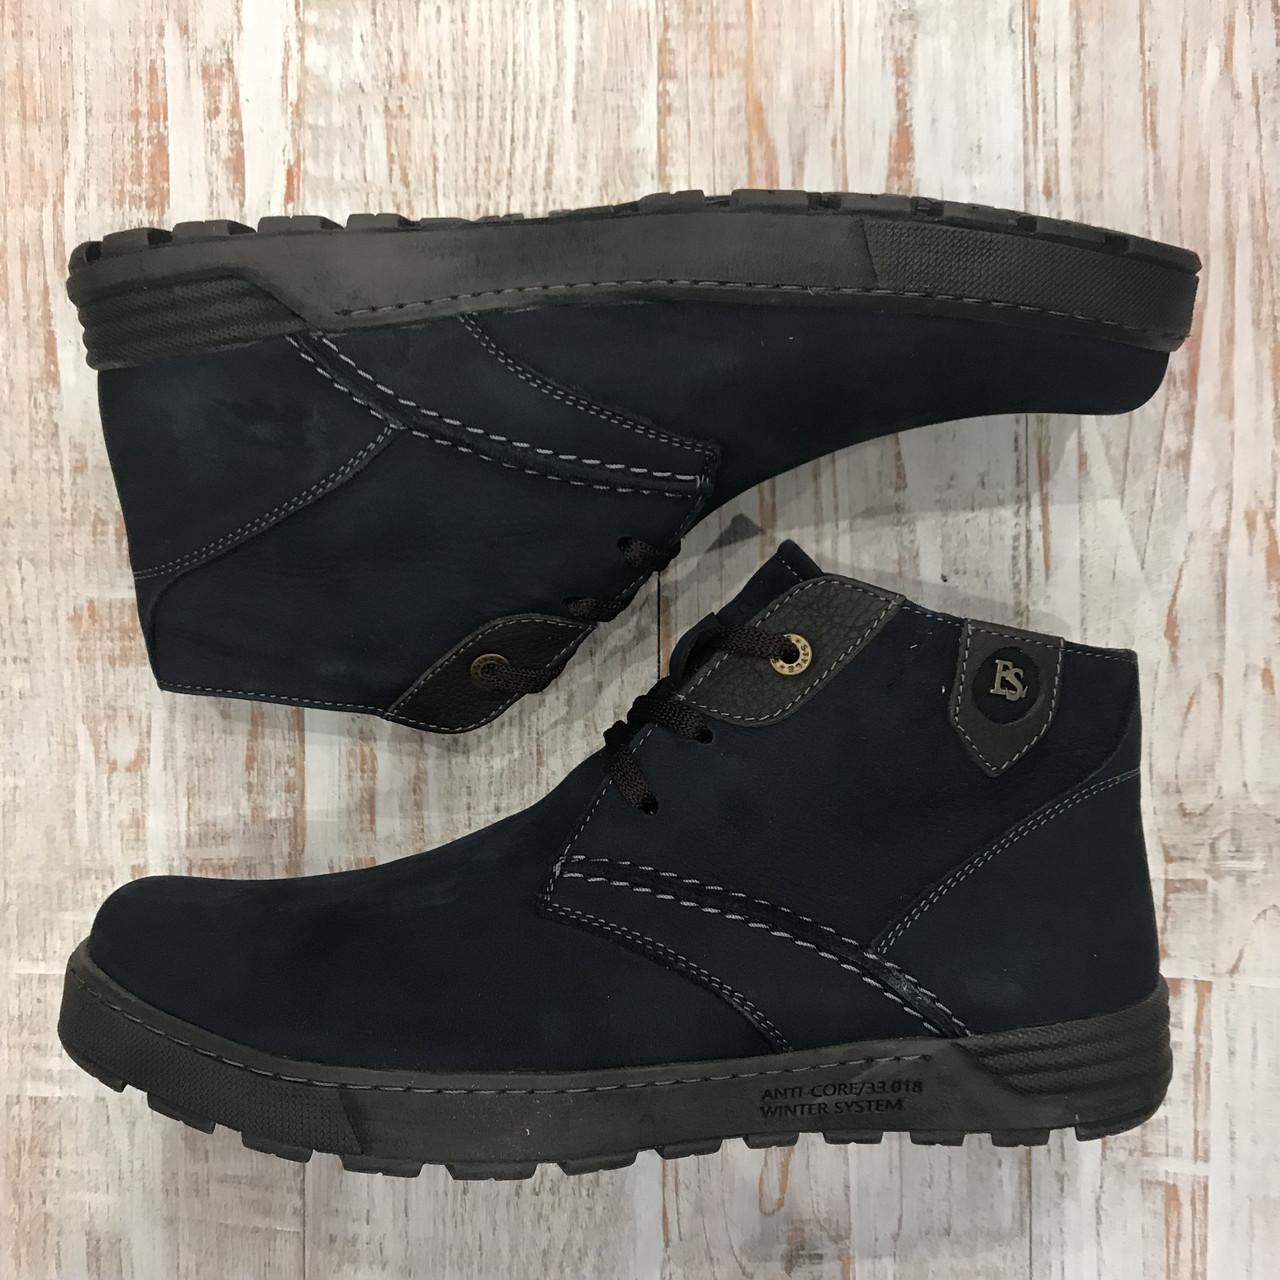 Зимние ботинки из нубука 42 размер d017a360b490a